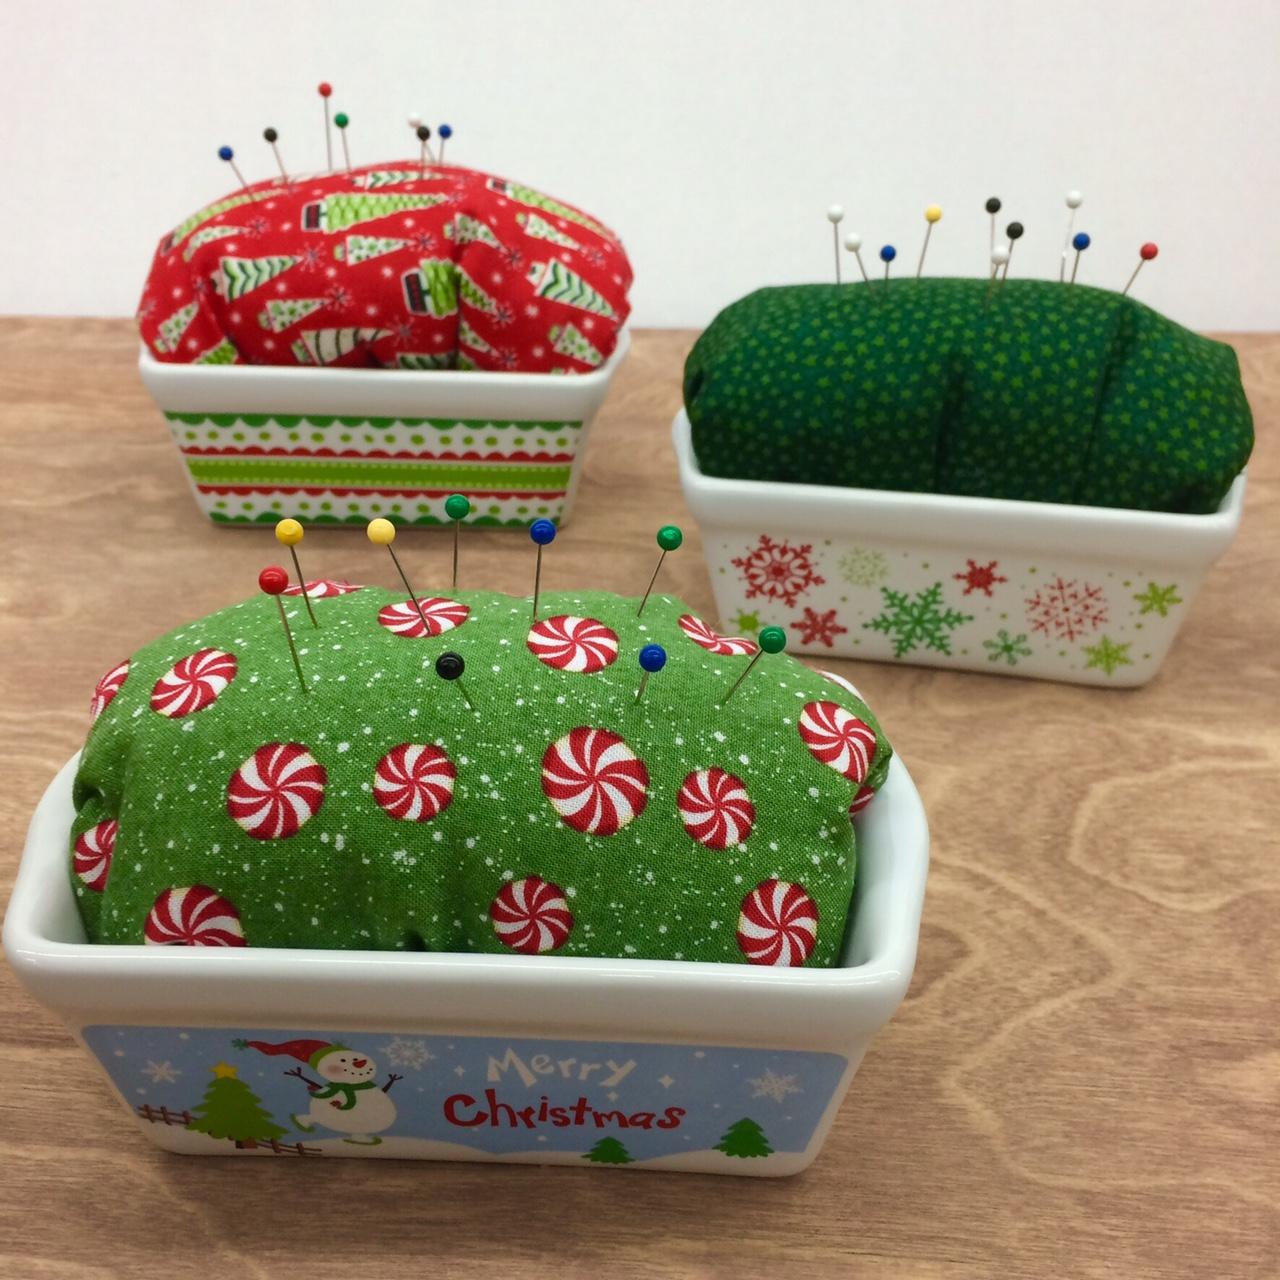 Mini Loaf Pan Pincushion Craft Warehouse